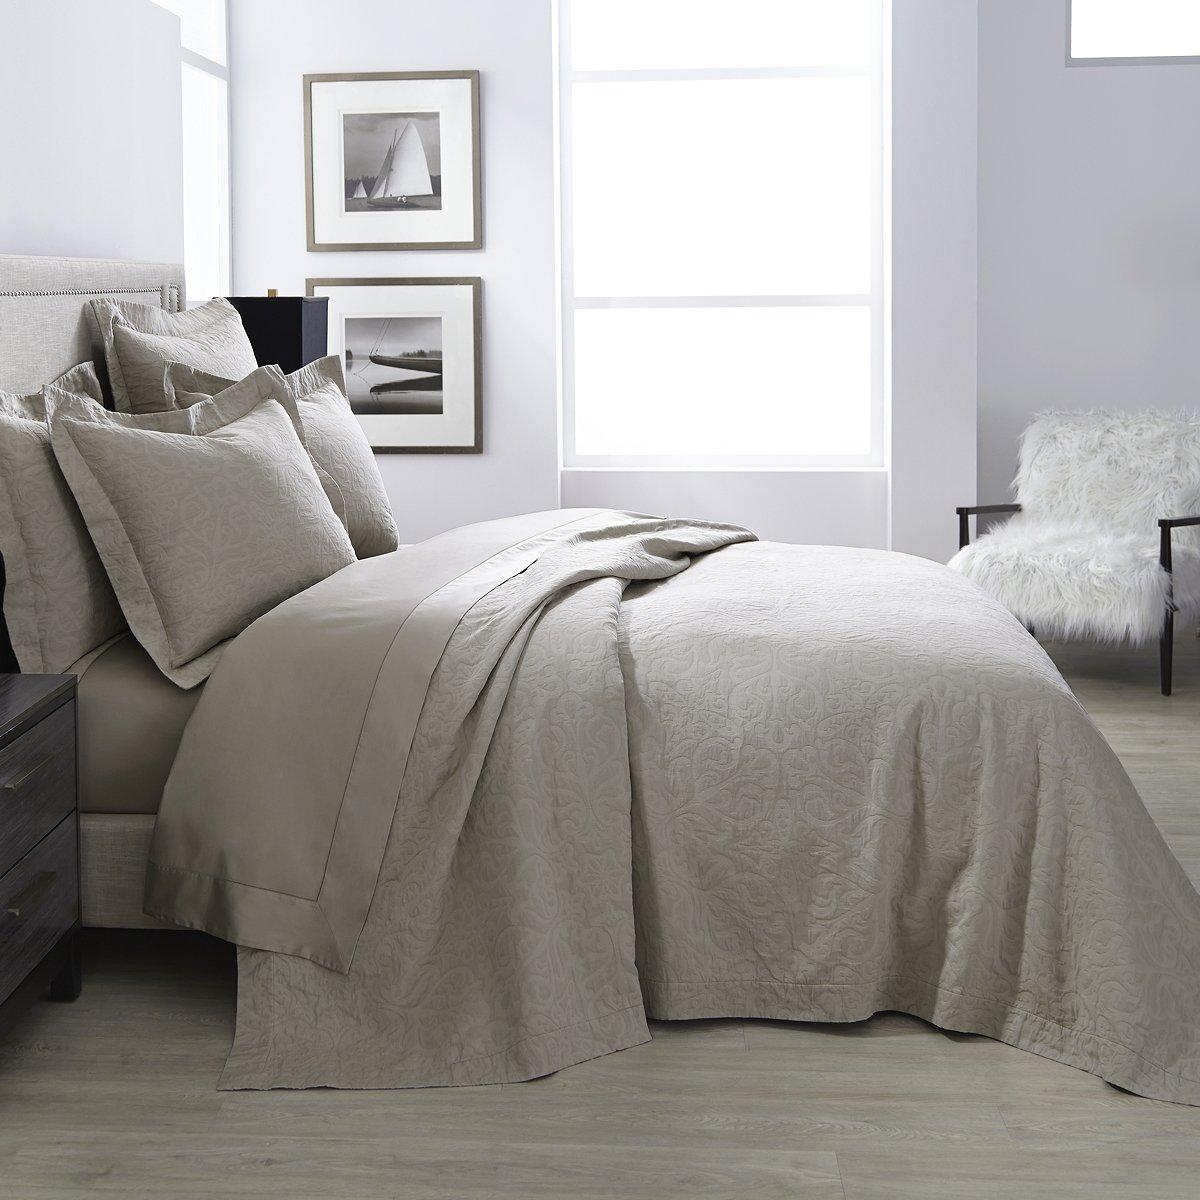 Battia毛布カバー& Shams by Sferra – Cashew King Blanket Cover 114x93 ブラウン B077CRRYCQ Cashew King Blanket Cover 114x93